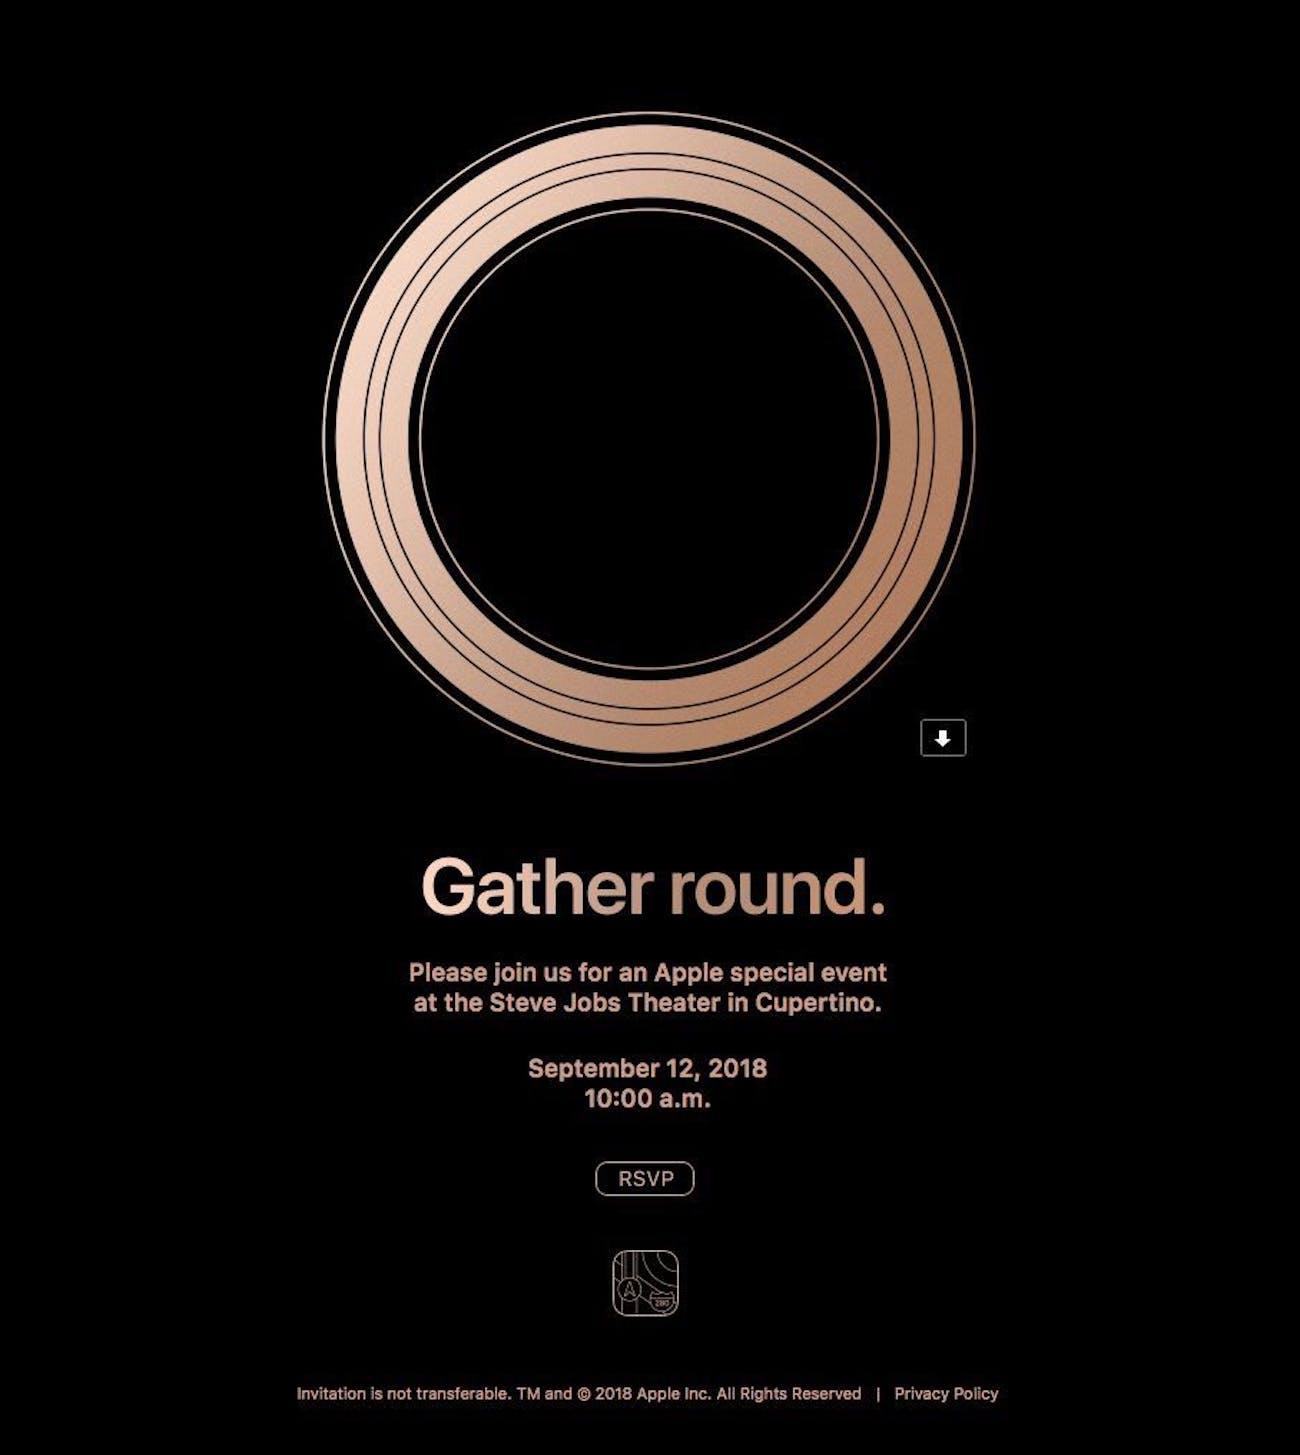 apple invites gather round